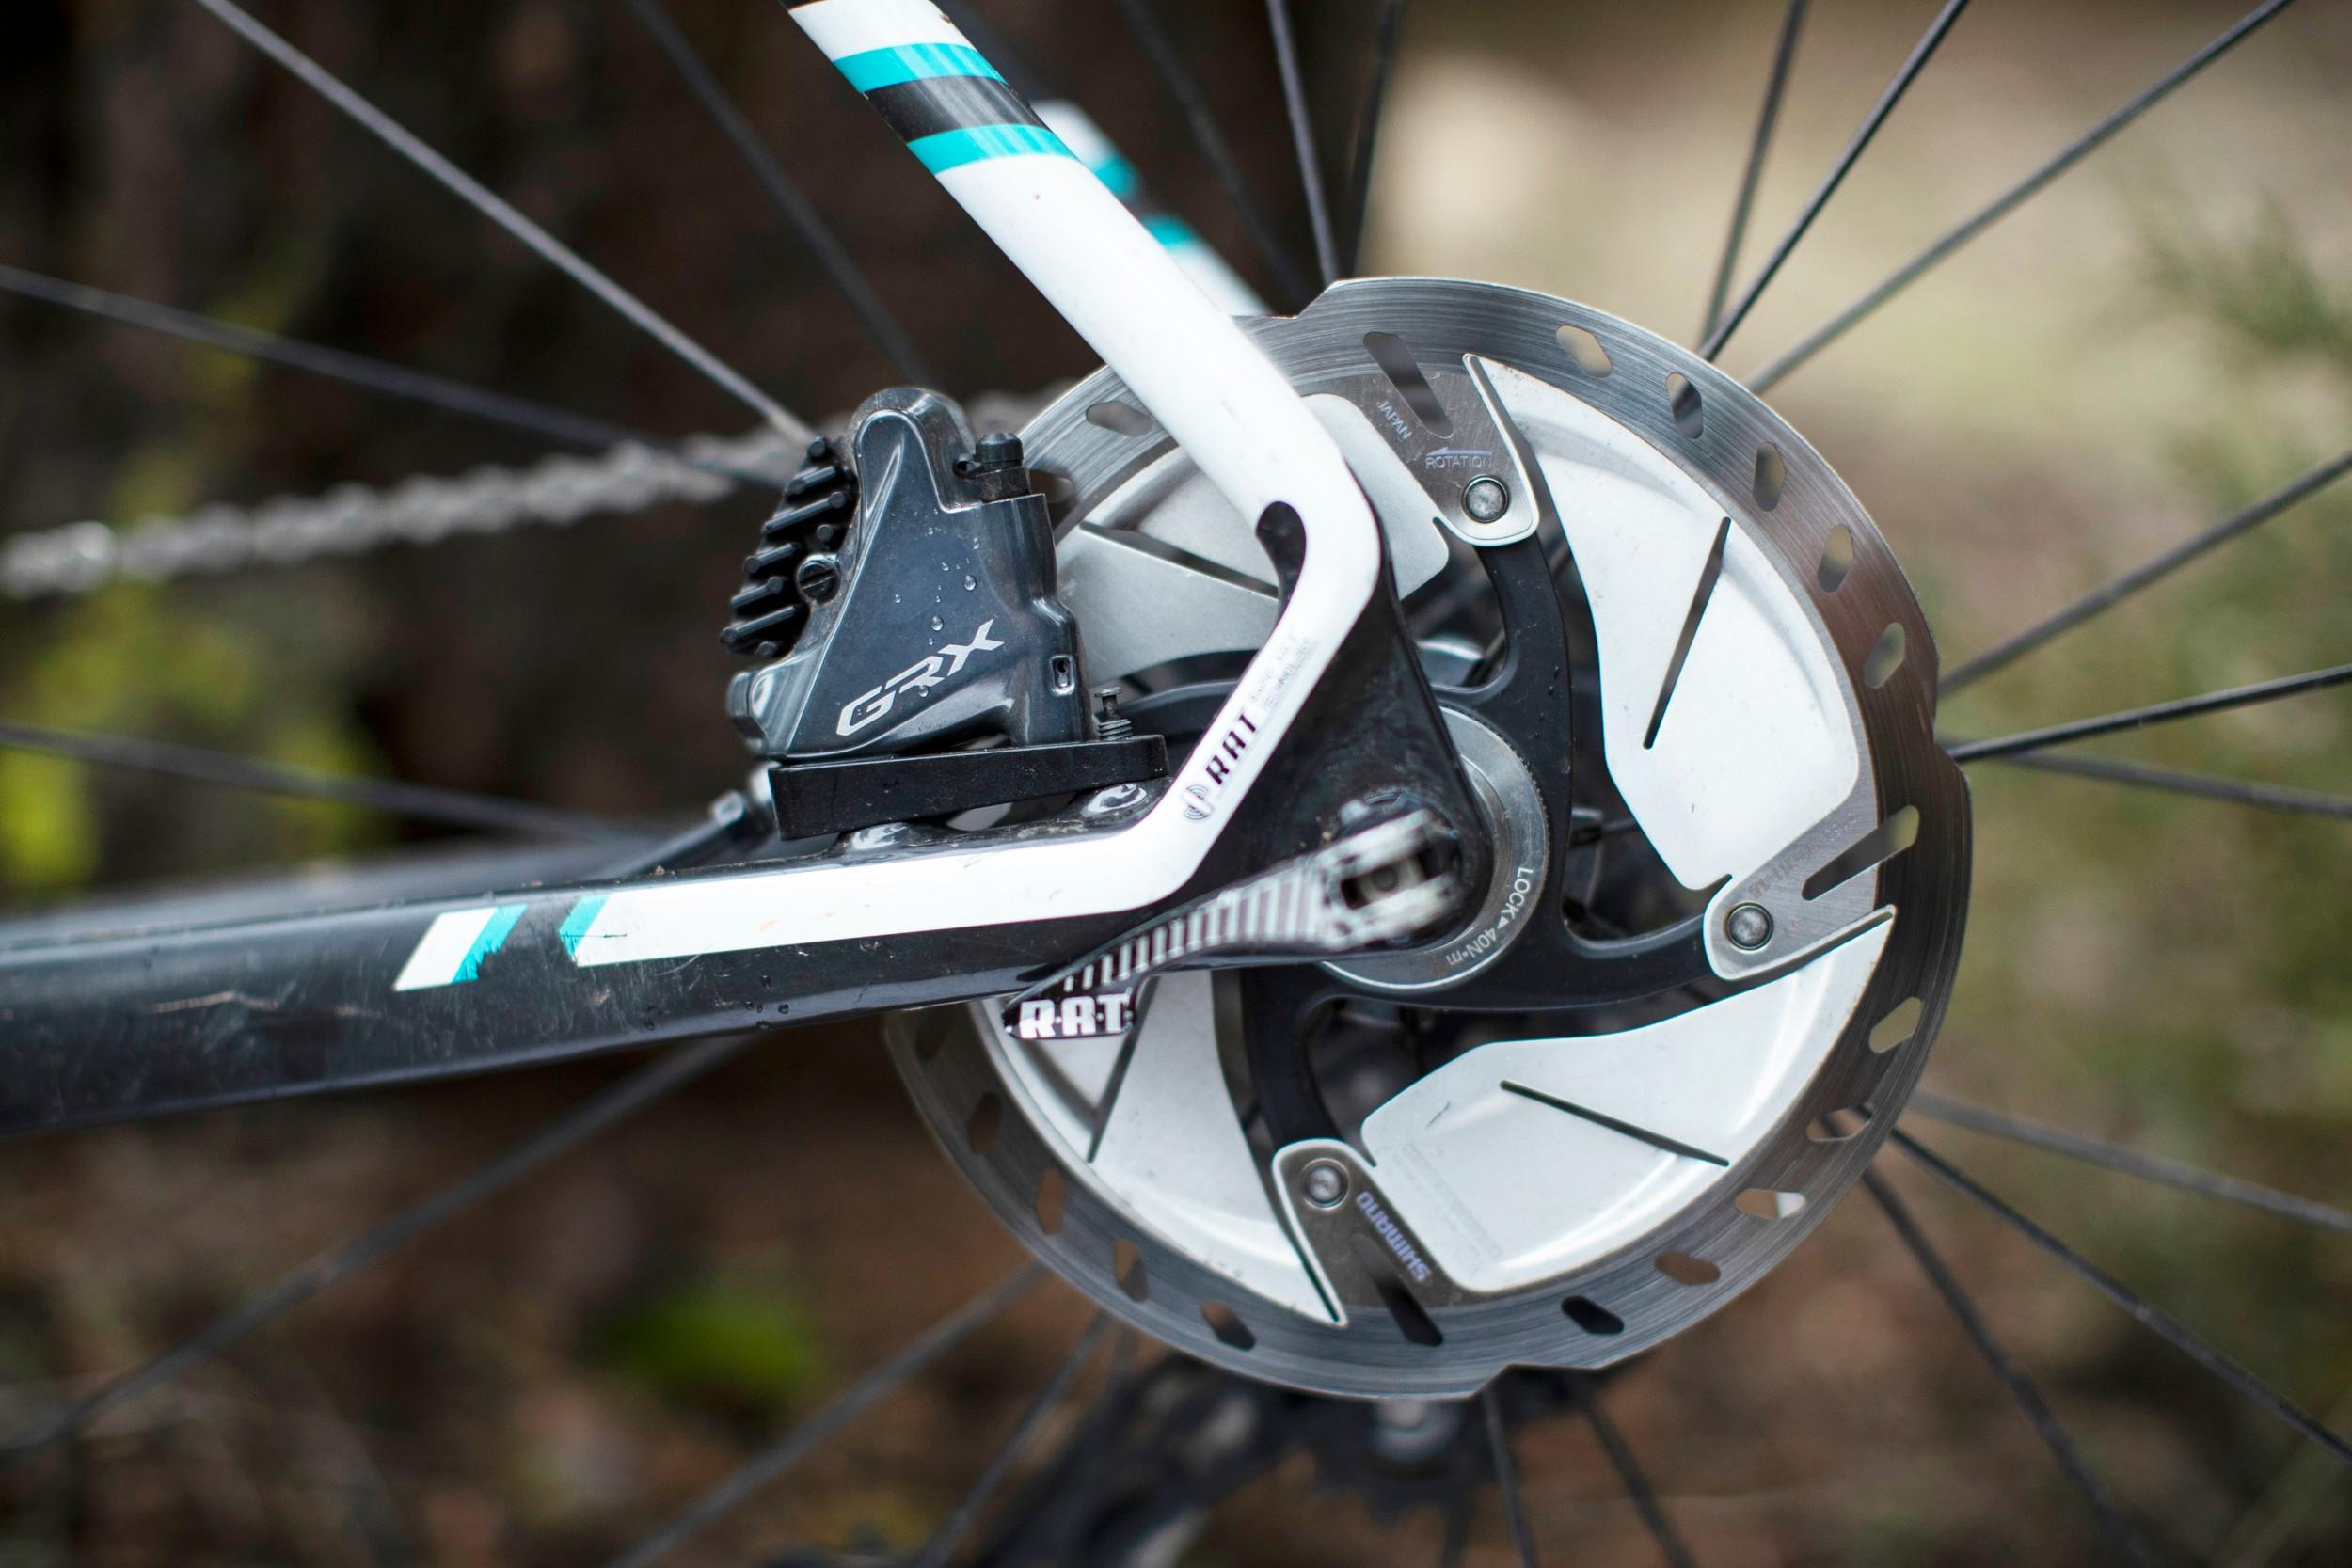 Shimano GRX disc brake caliper and disc mounted to rear of bike frame